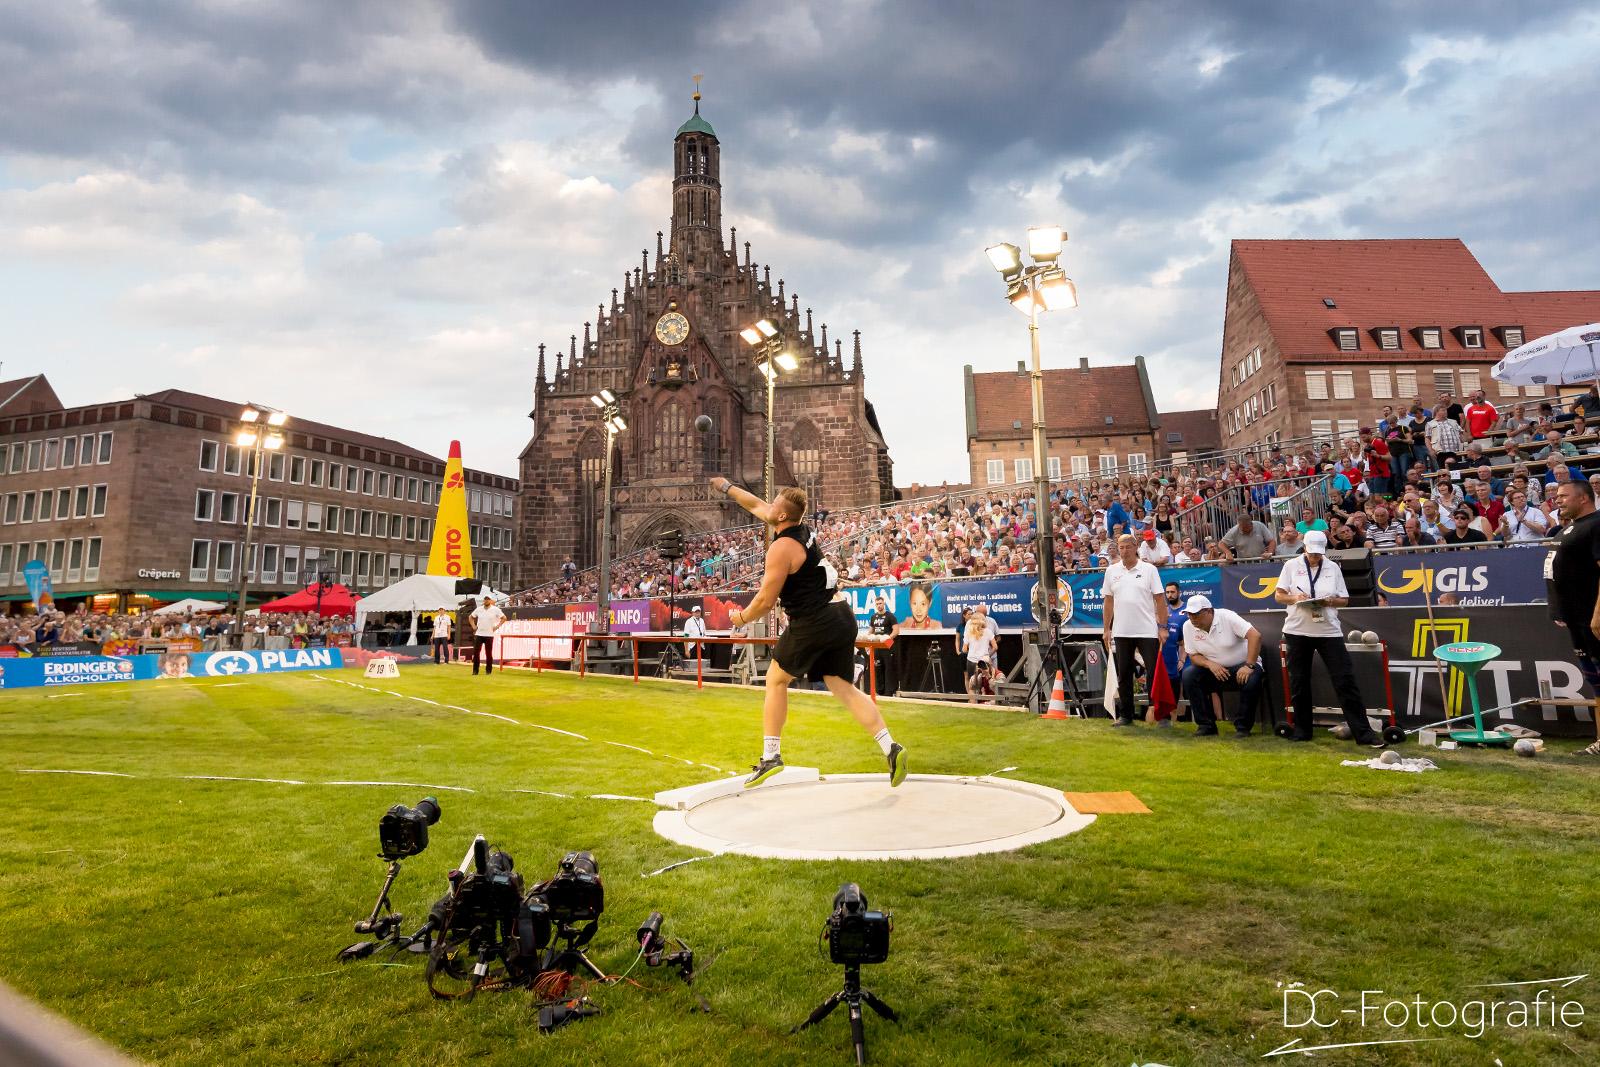 Leichtathletik Hauptmarkt Nürnberg